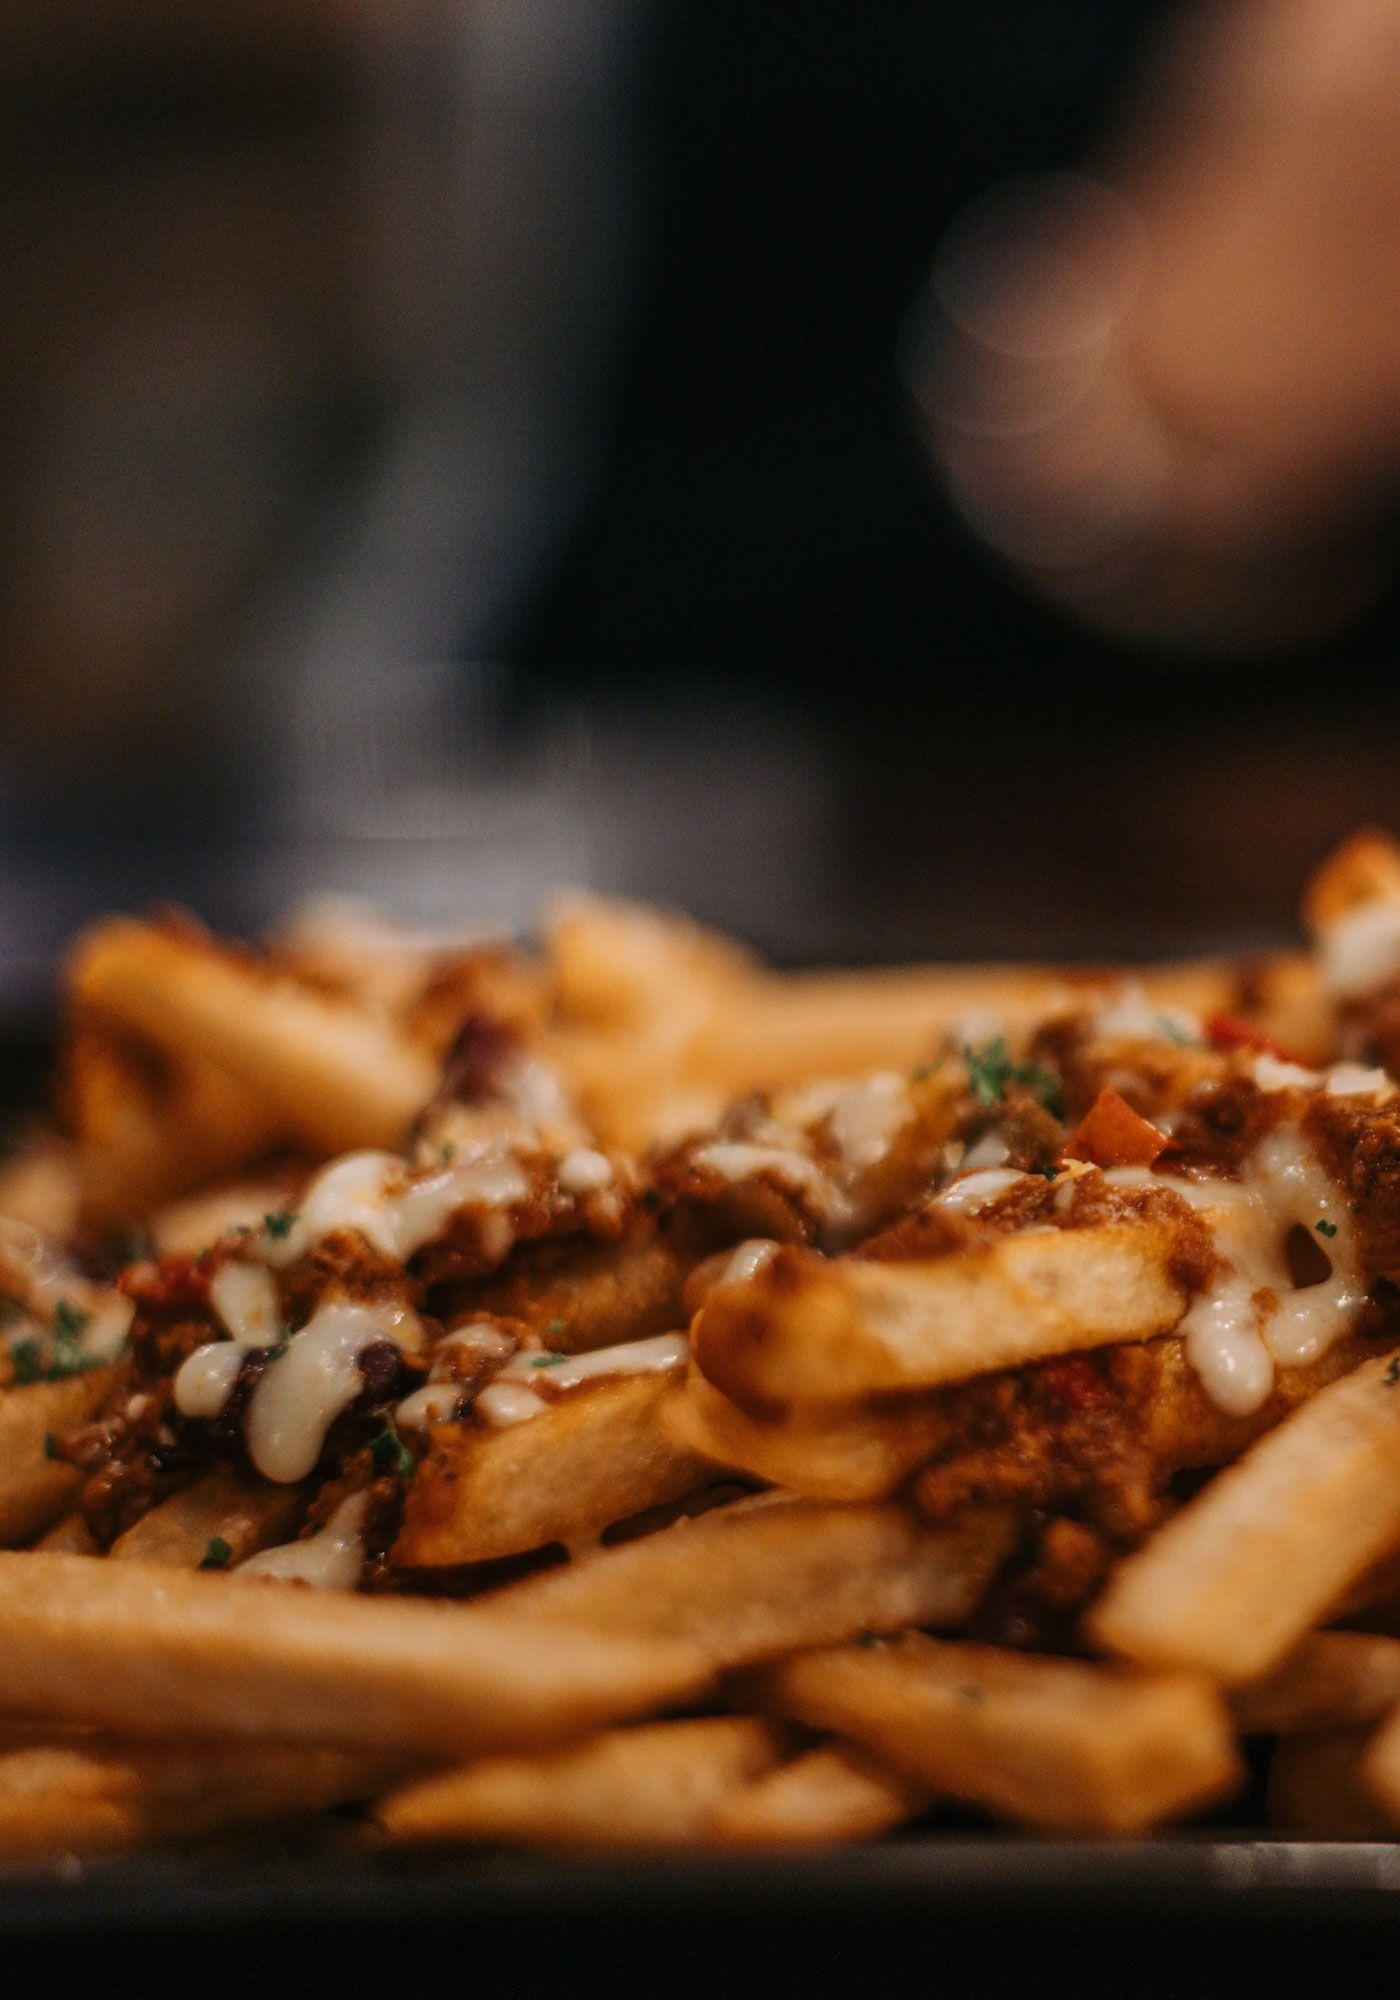 chilli-fries